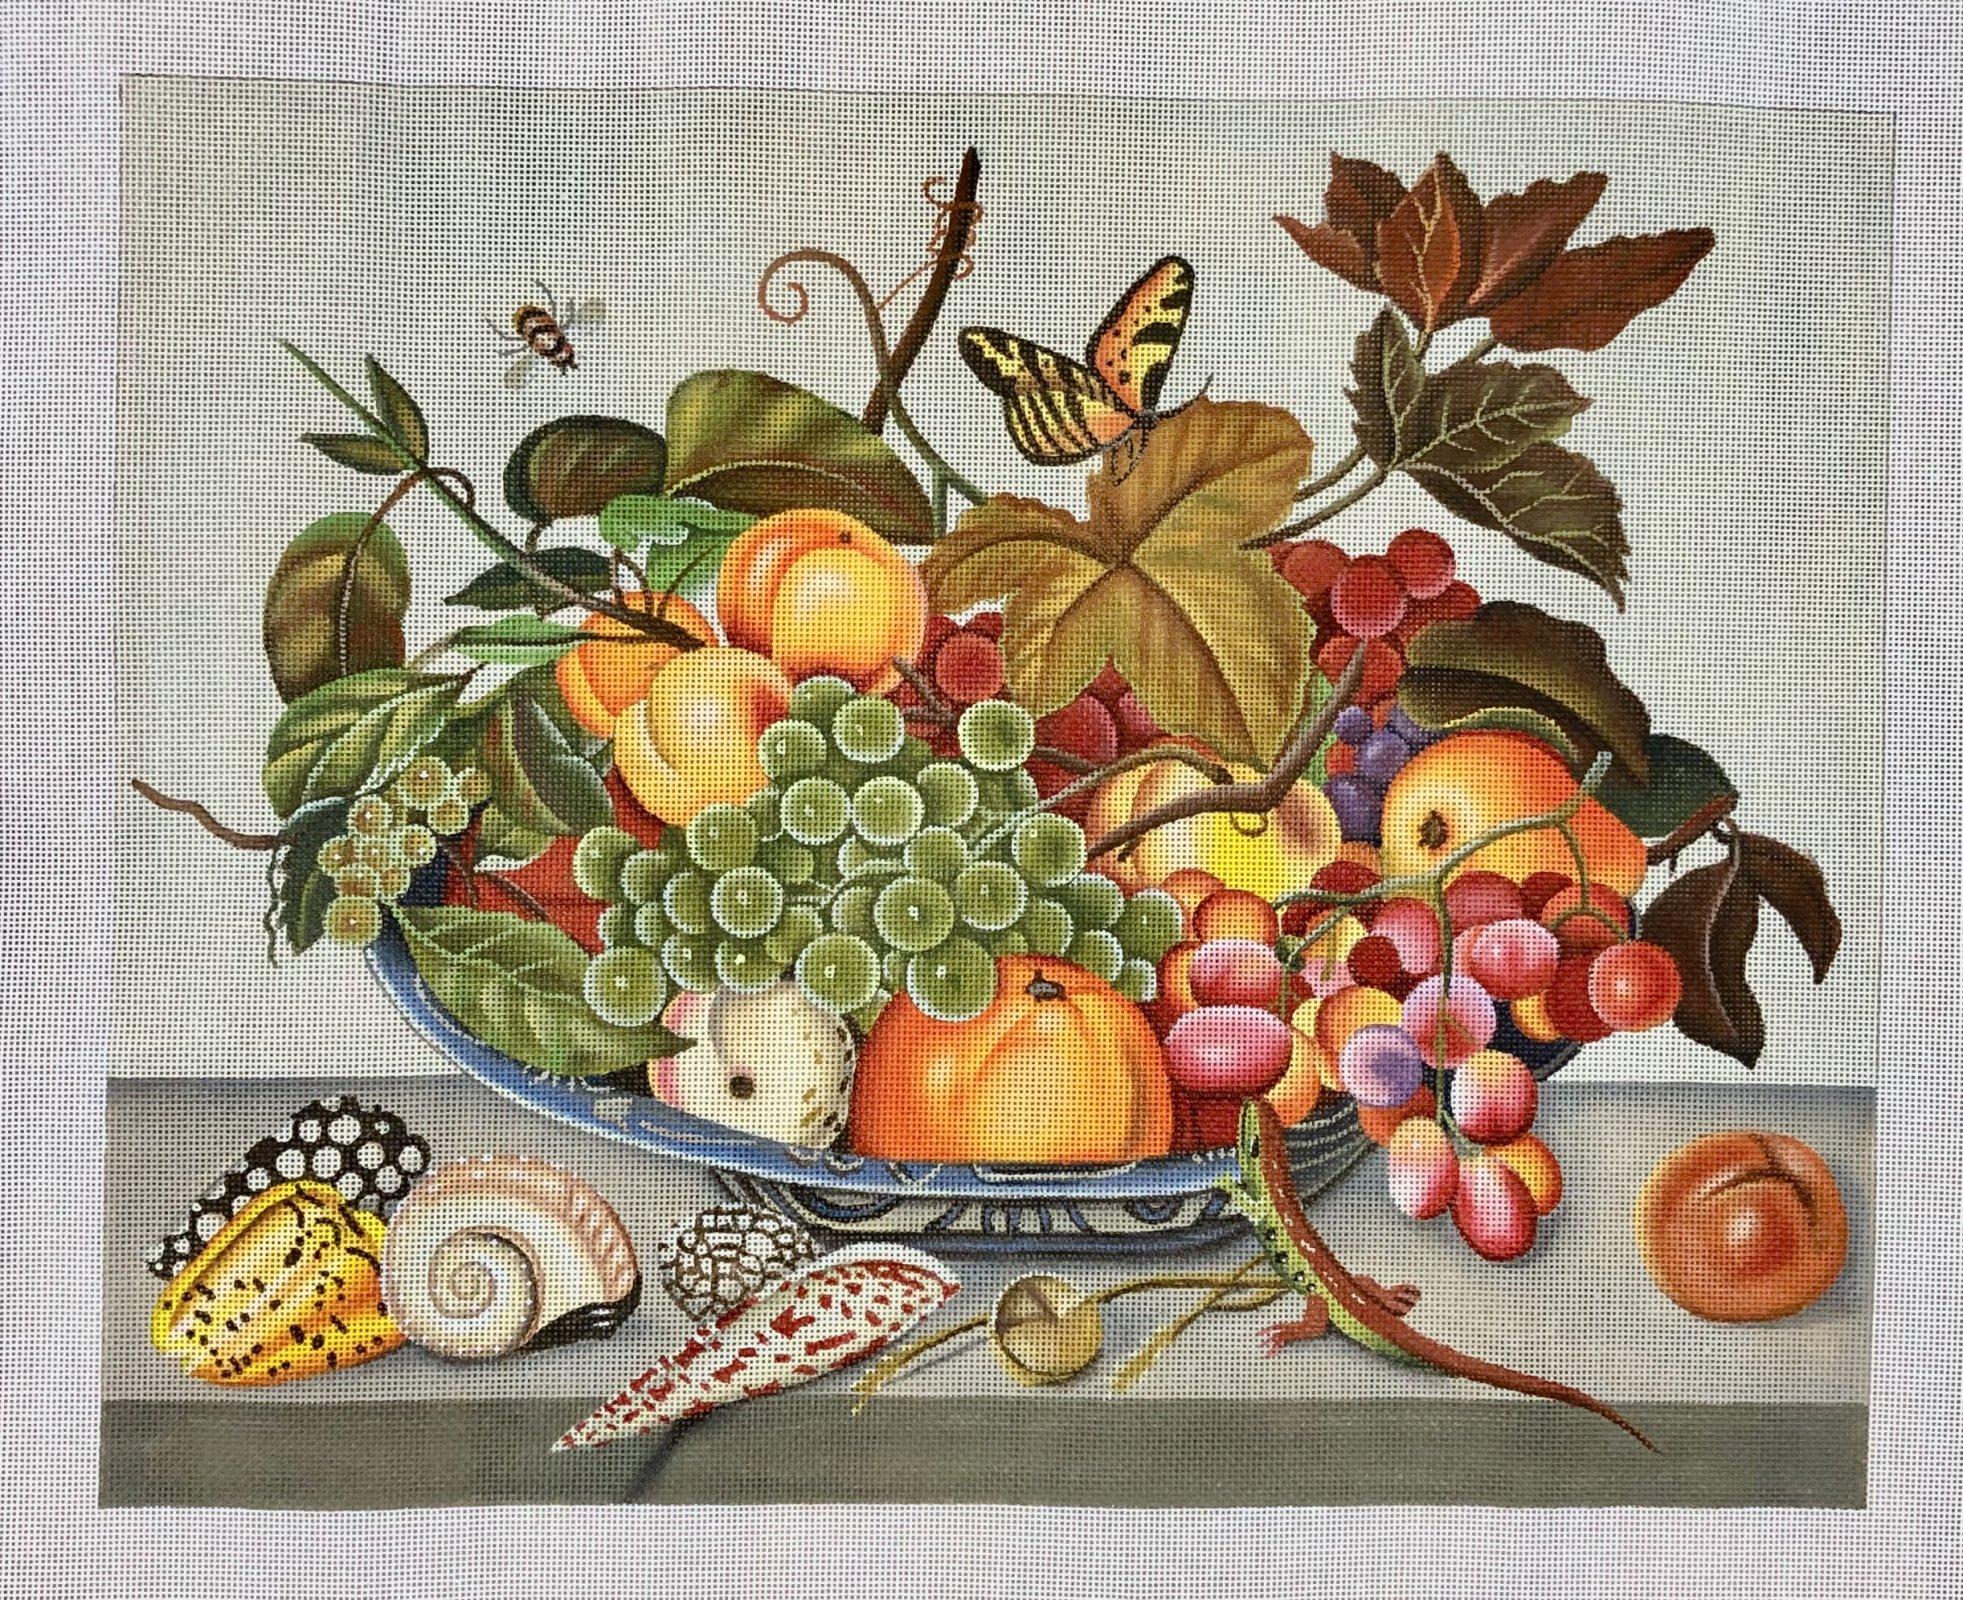 fruit bowl & shells